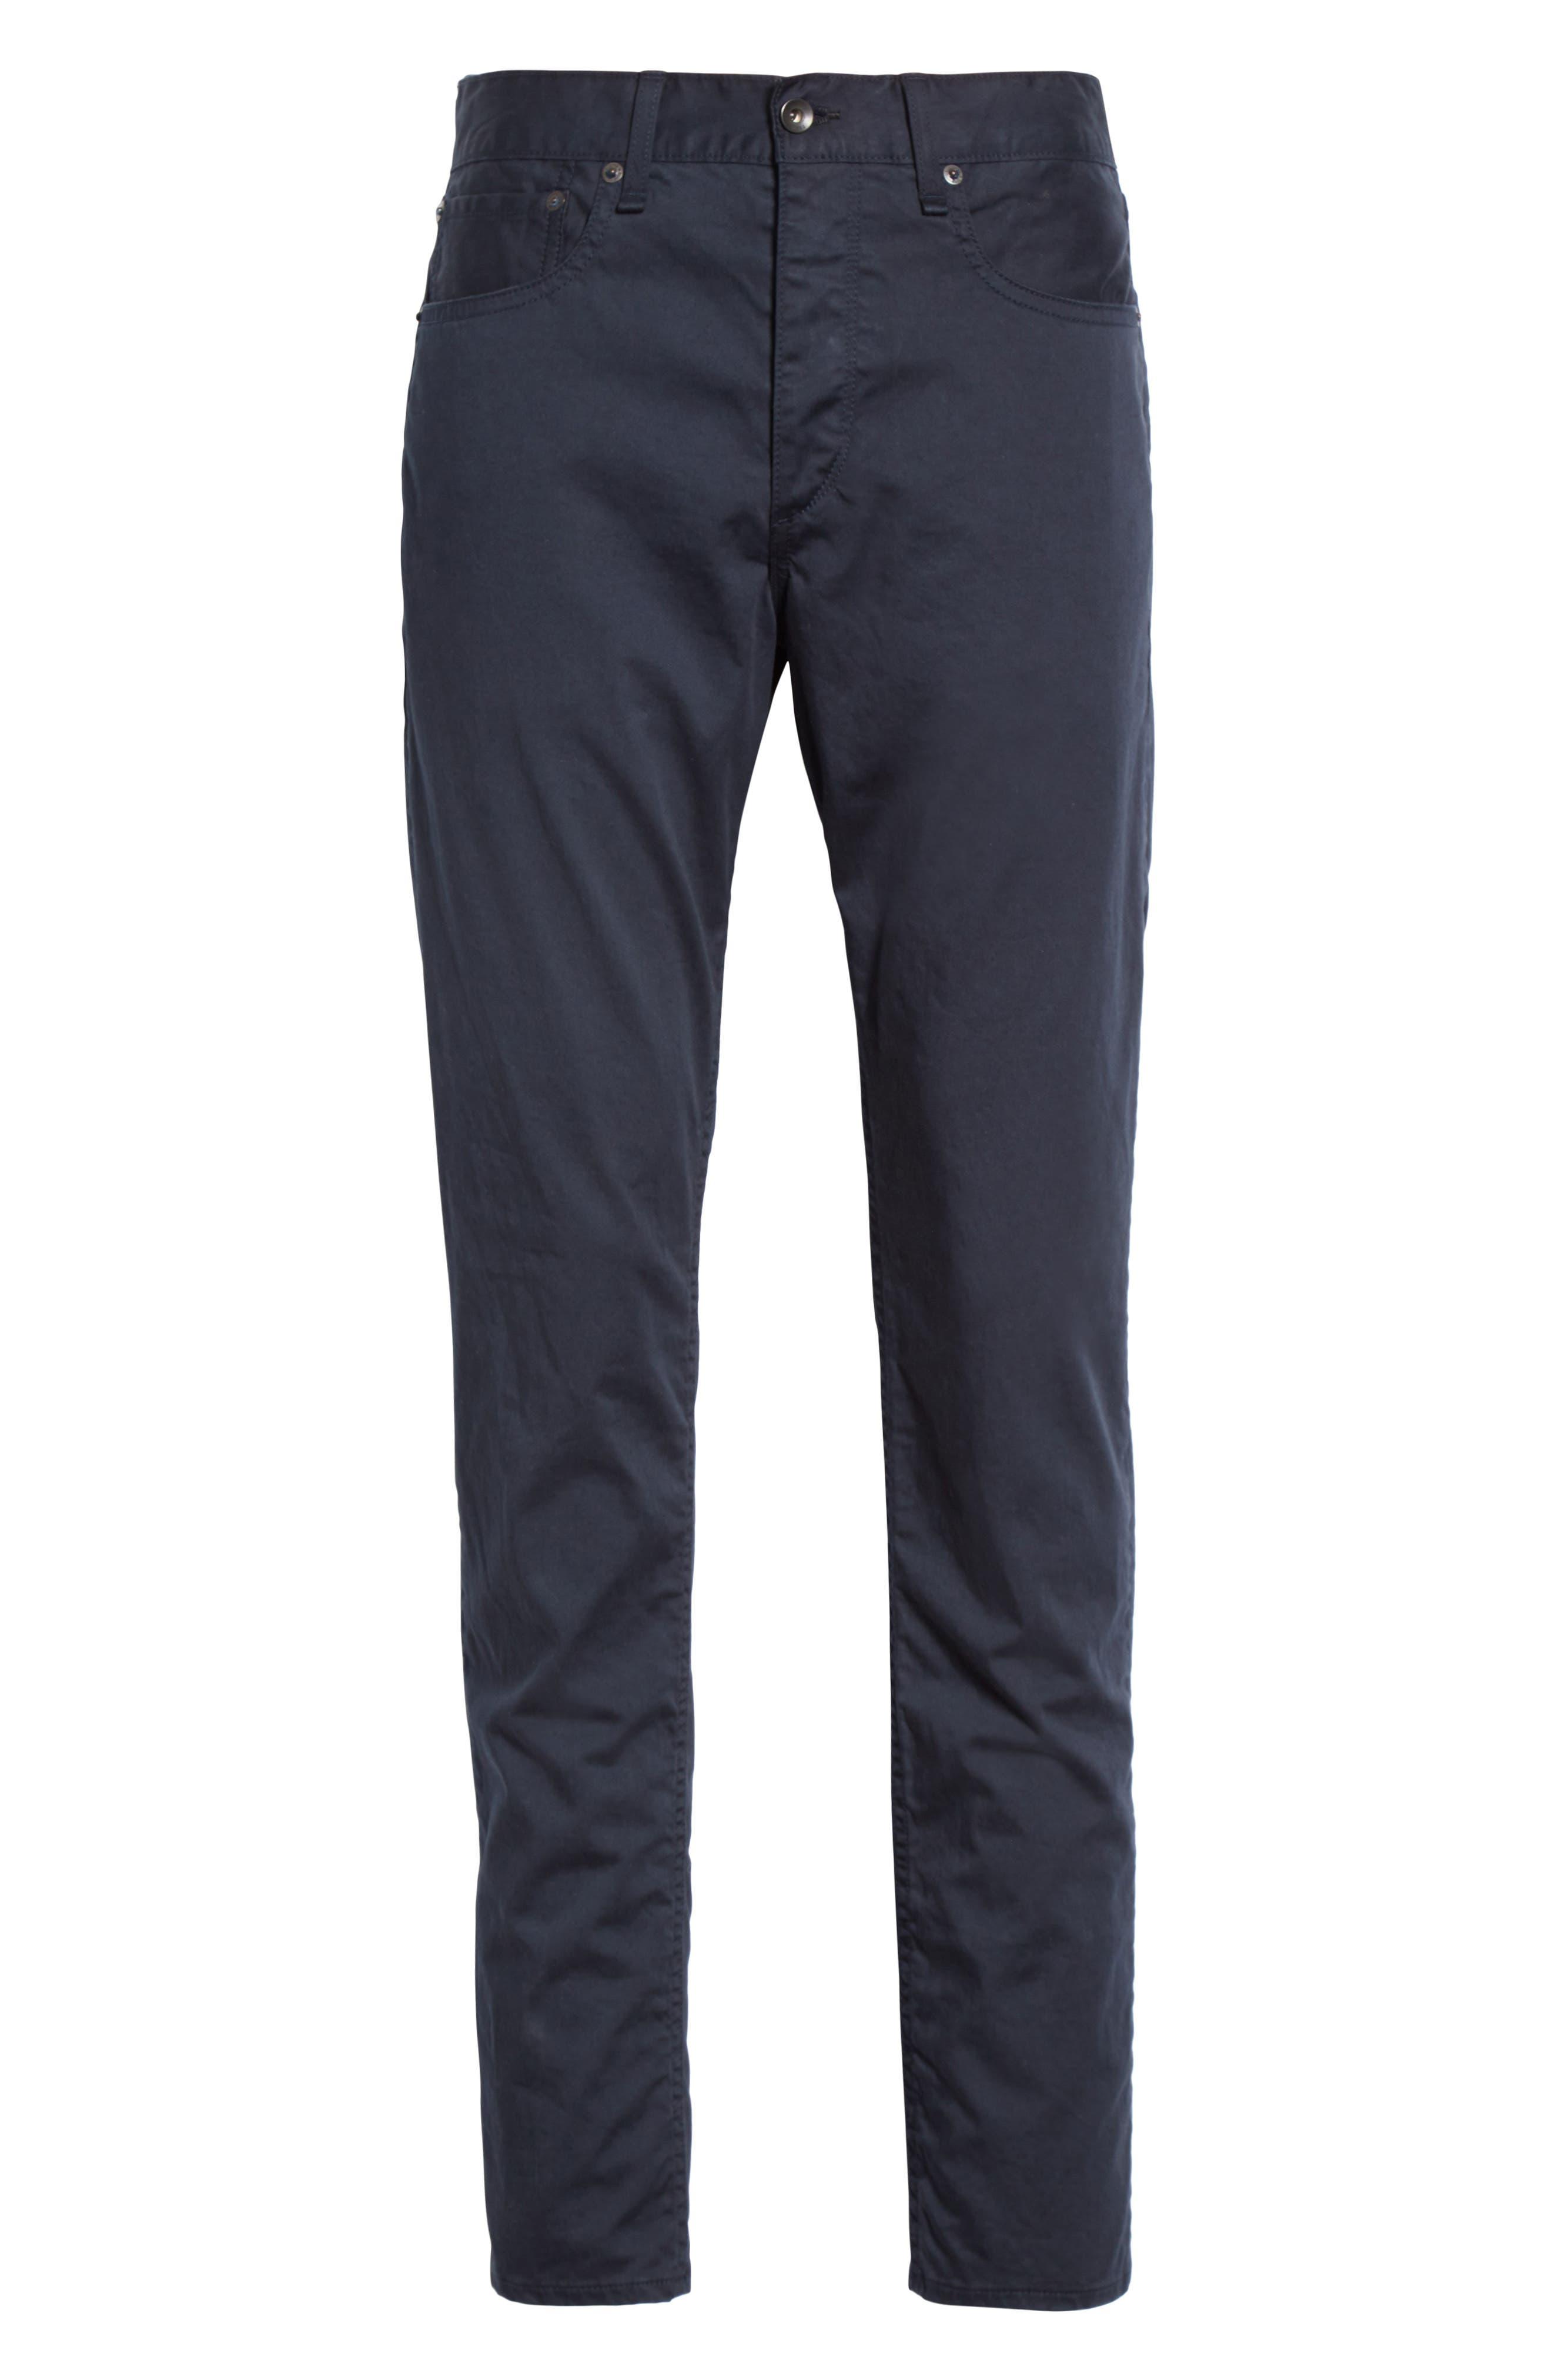 Fit 2 Five-Pocket Twill Pants,                             Alternate thumbnail 6, color,                             410